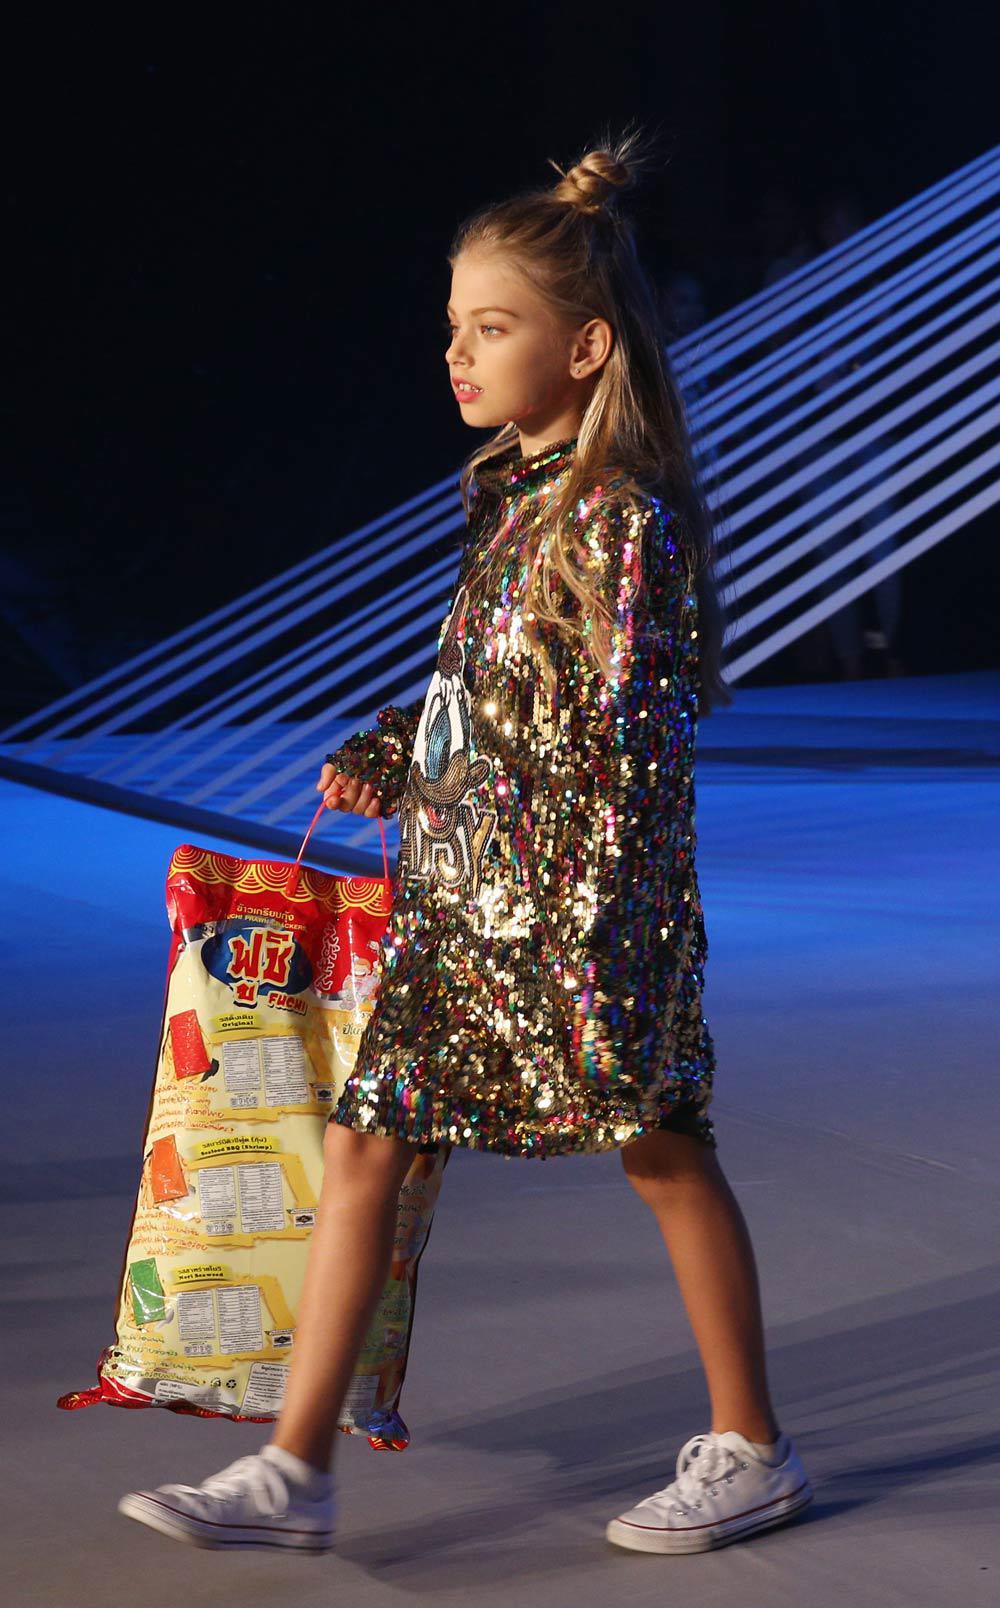 sieu mau thanh hang, minh tu cung nhau dot chay san dien asian kids fashion week - 4